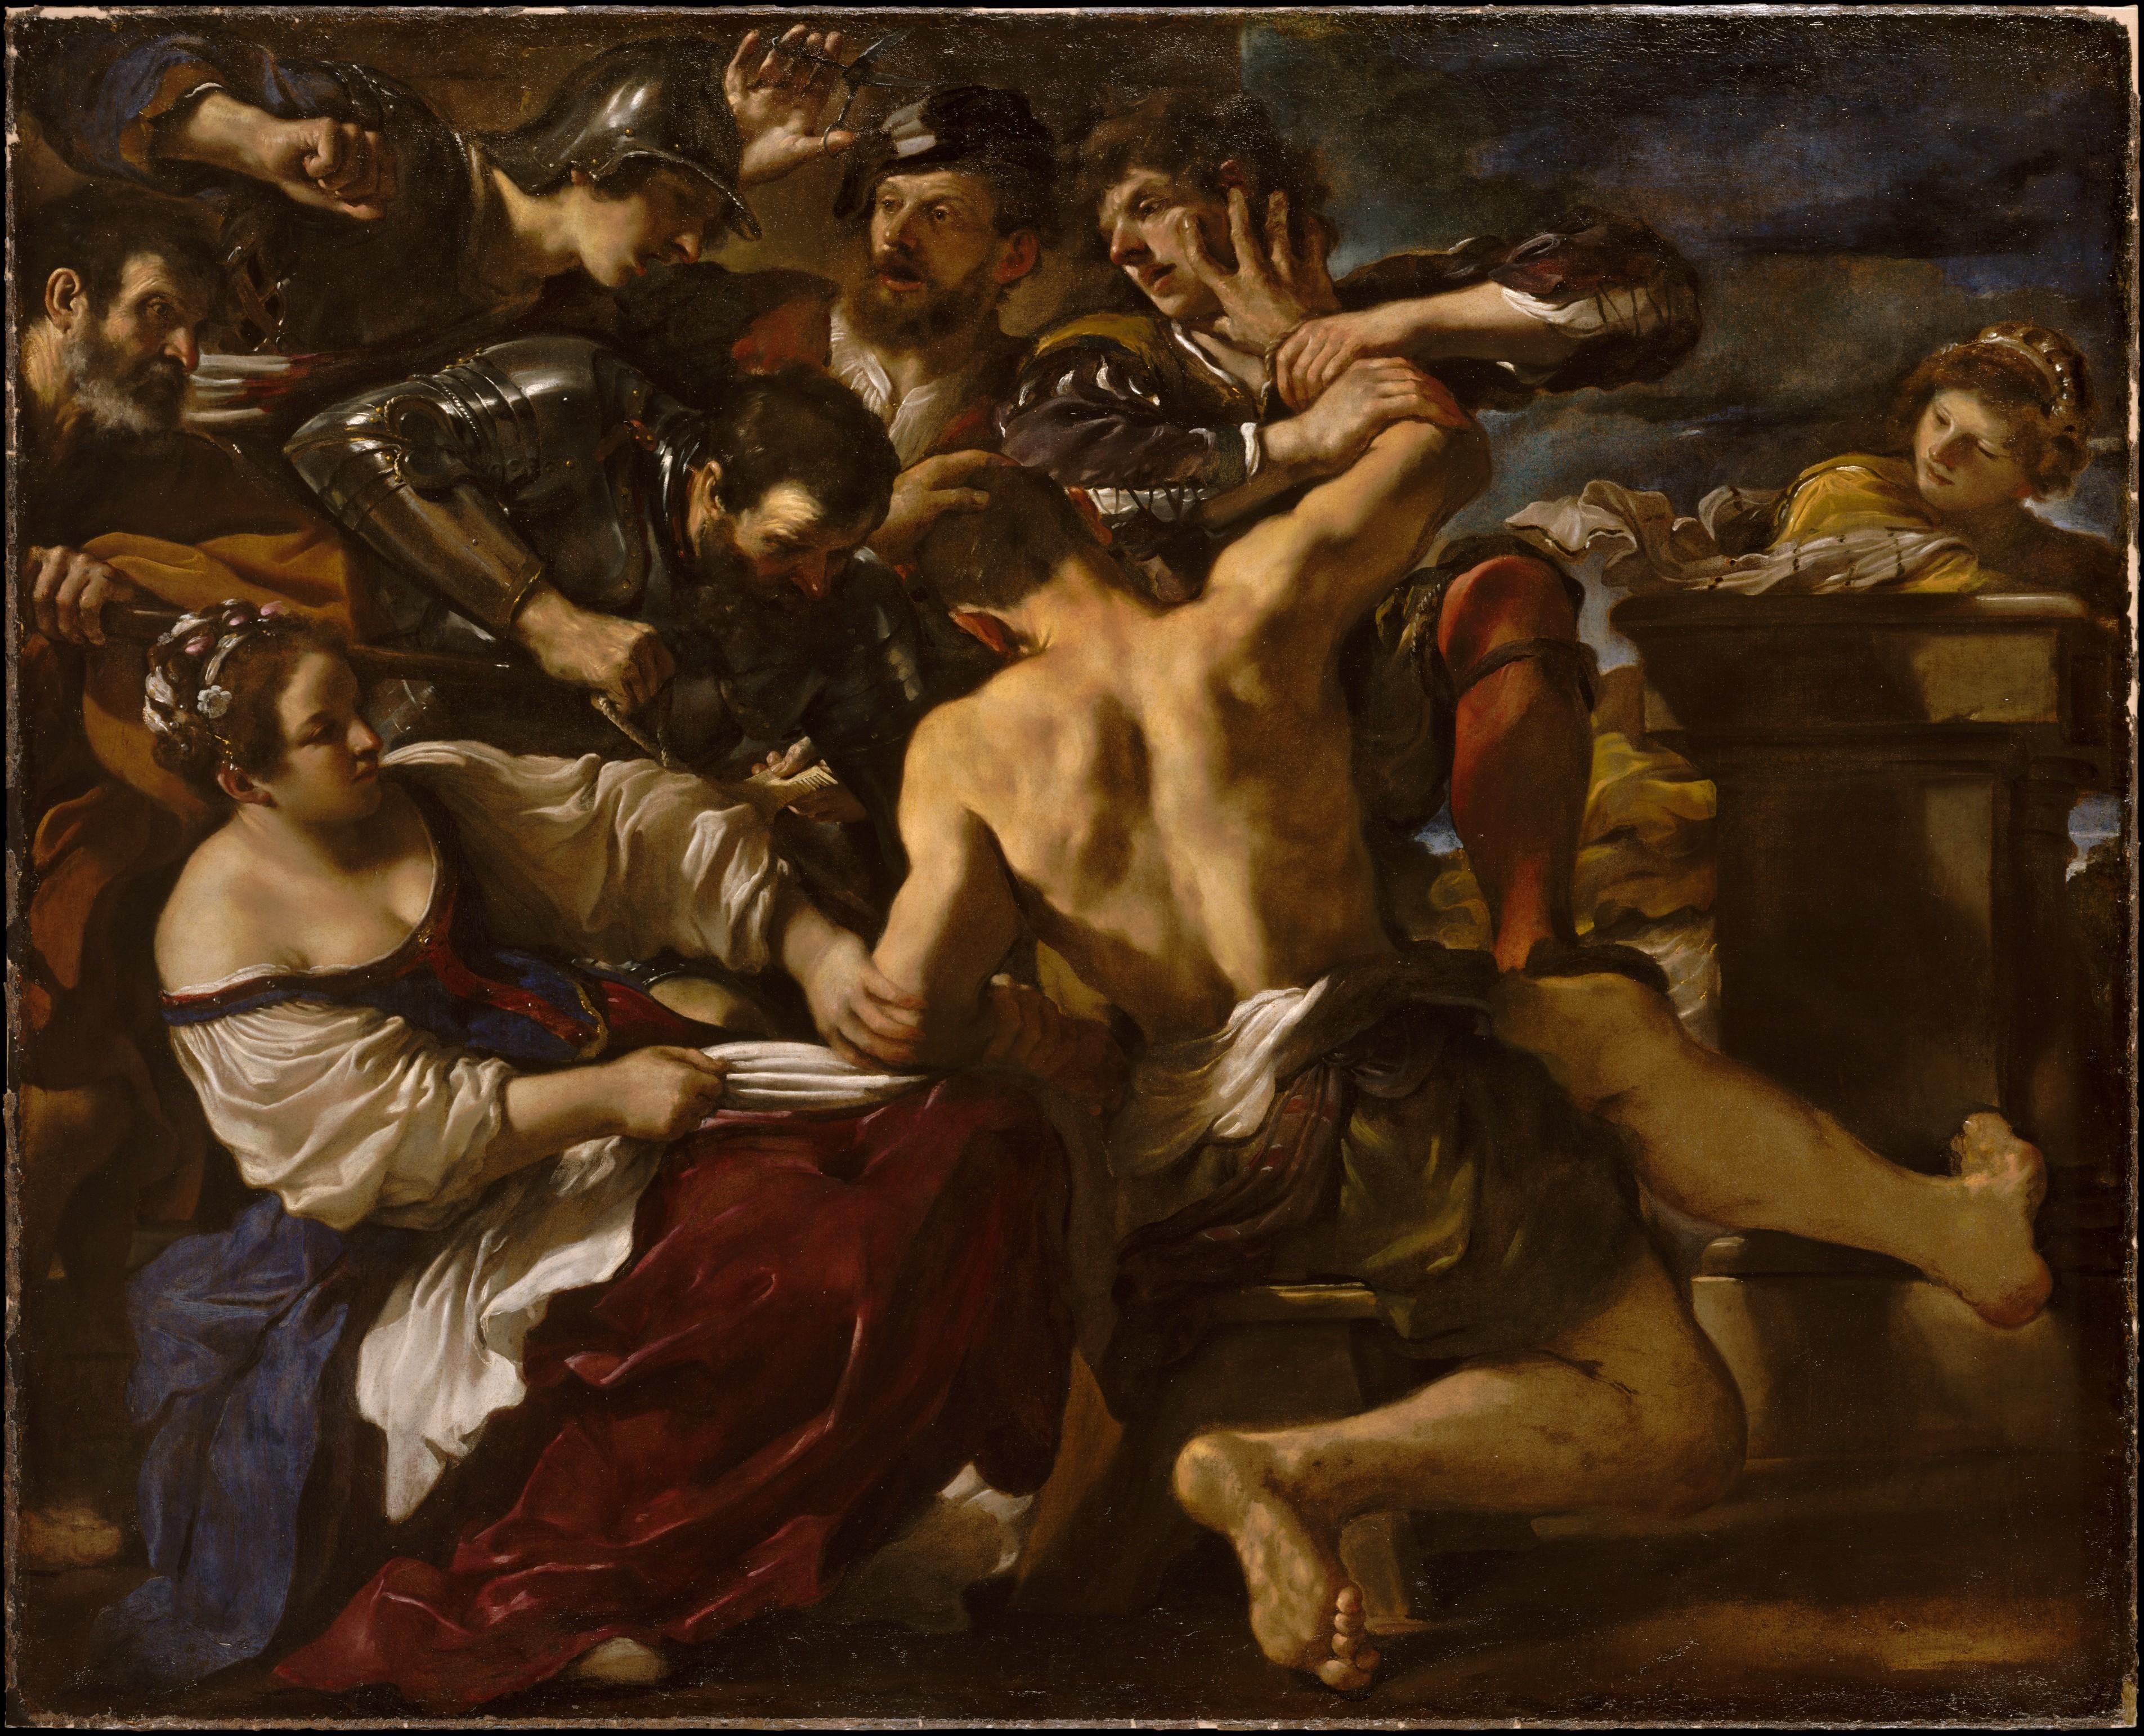 guercino giovanni francesco barbieri samson captured by the